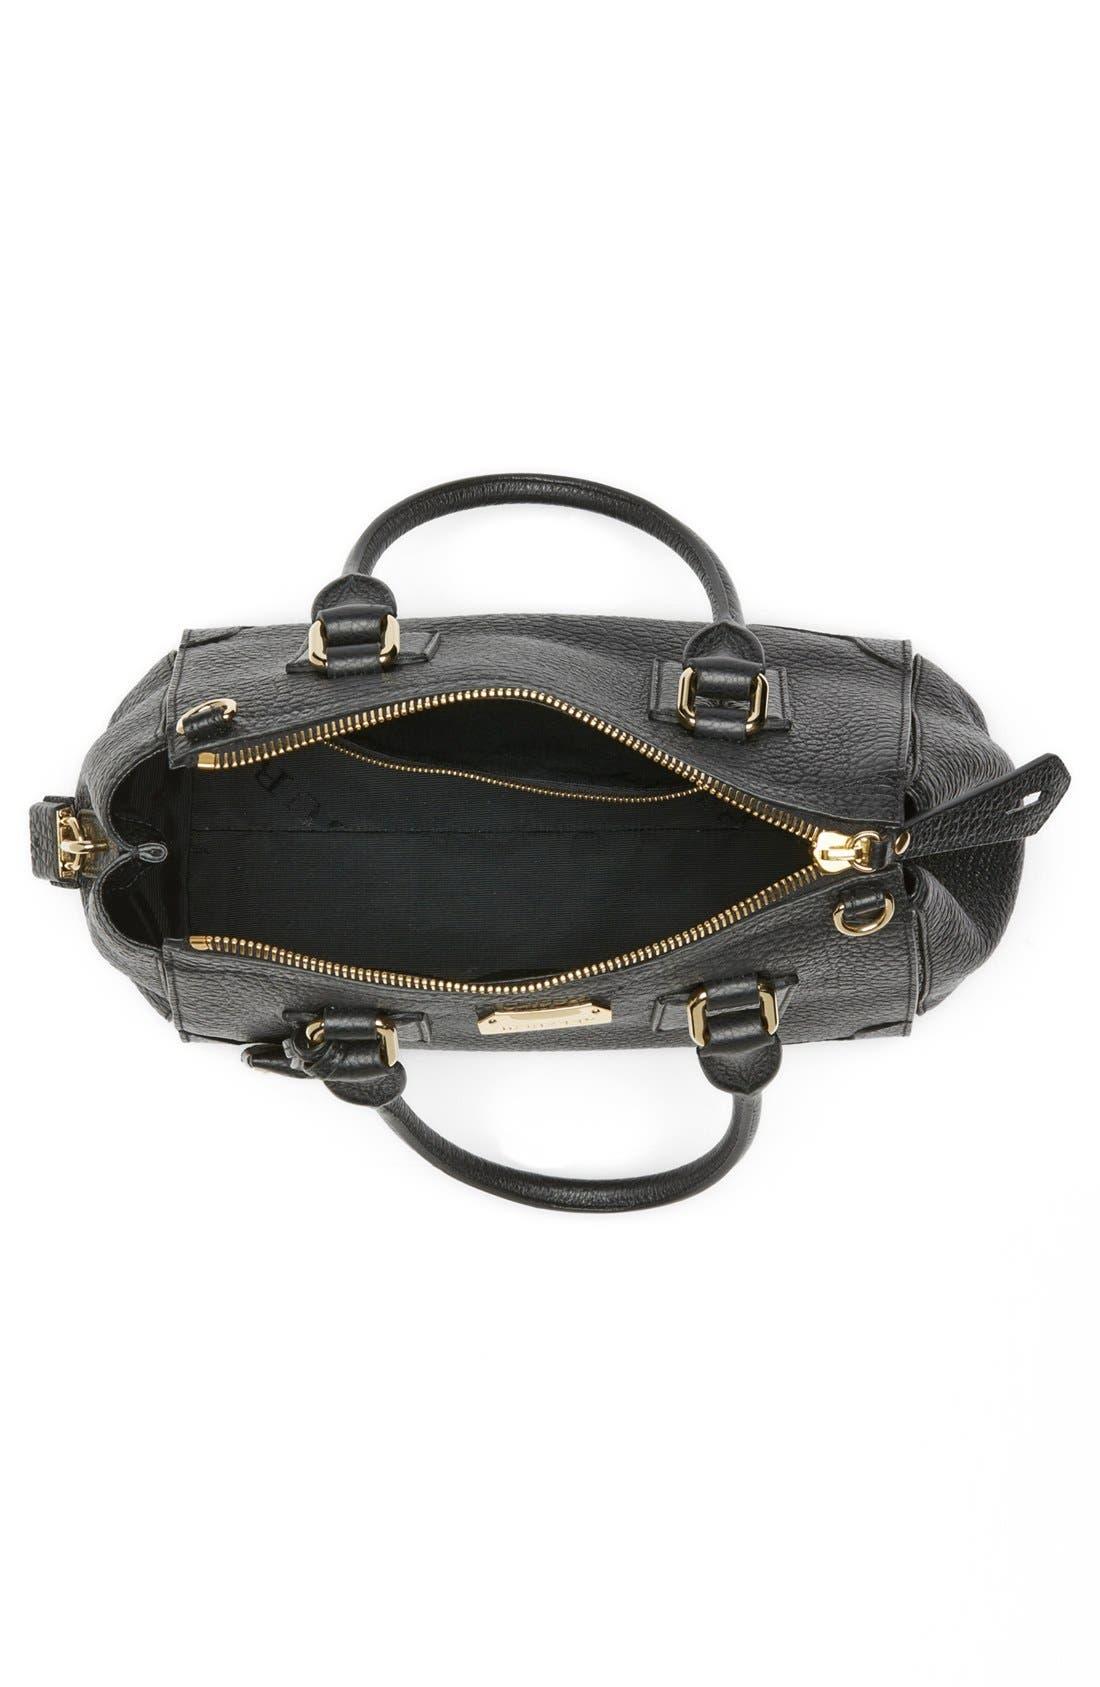 Alternate Image 3  - Burberry 'Gladstone - Small' Leather Satchel